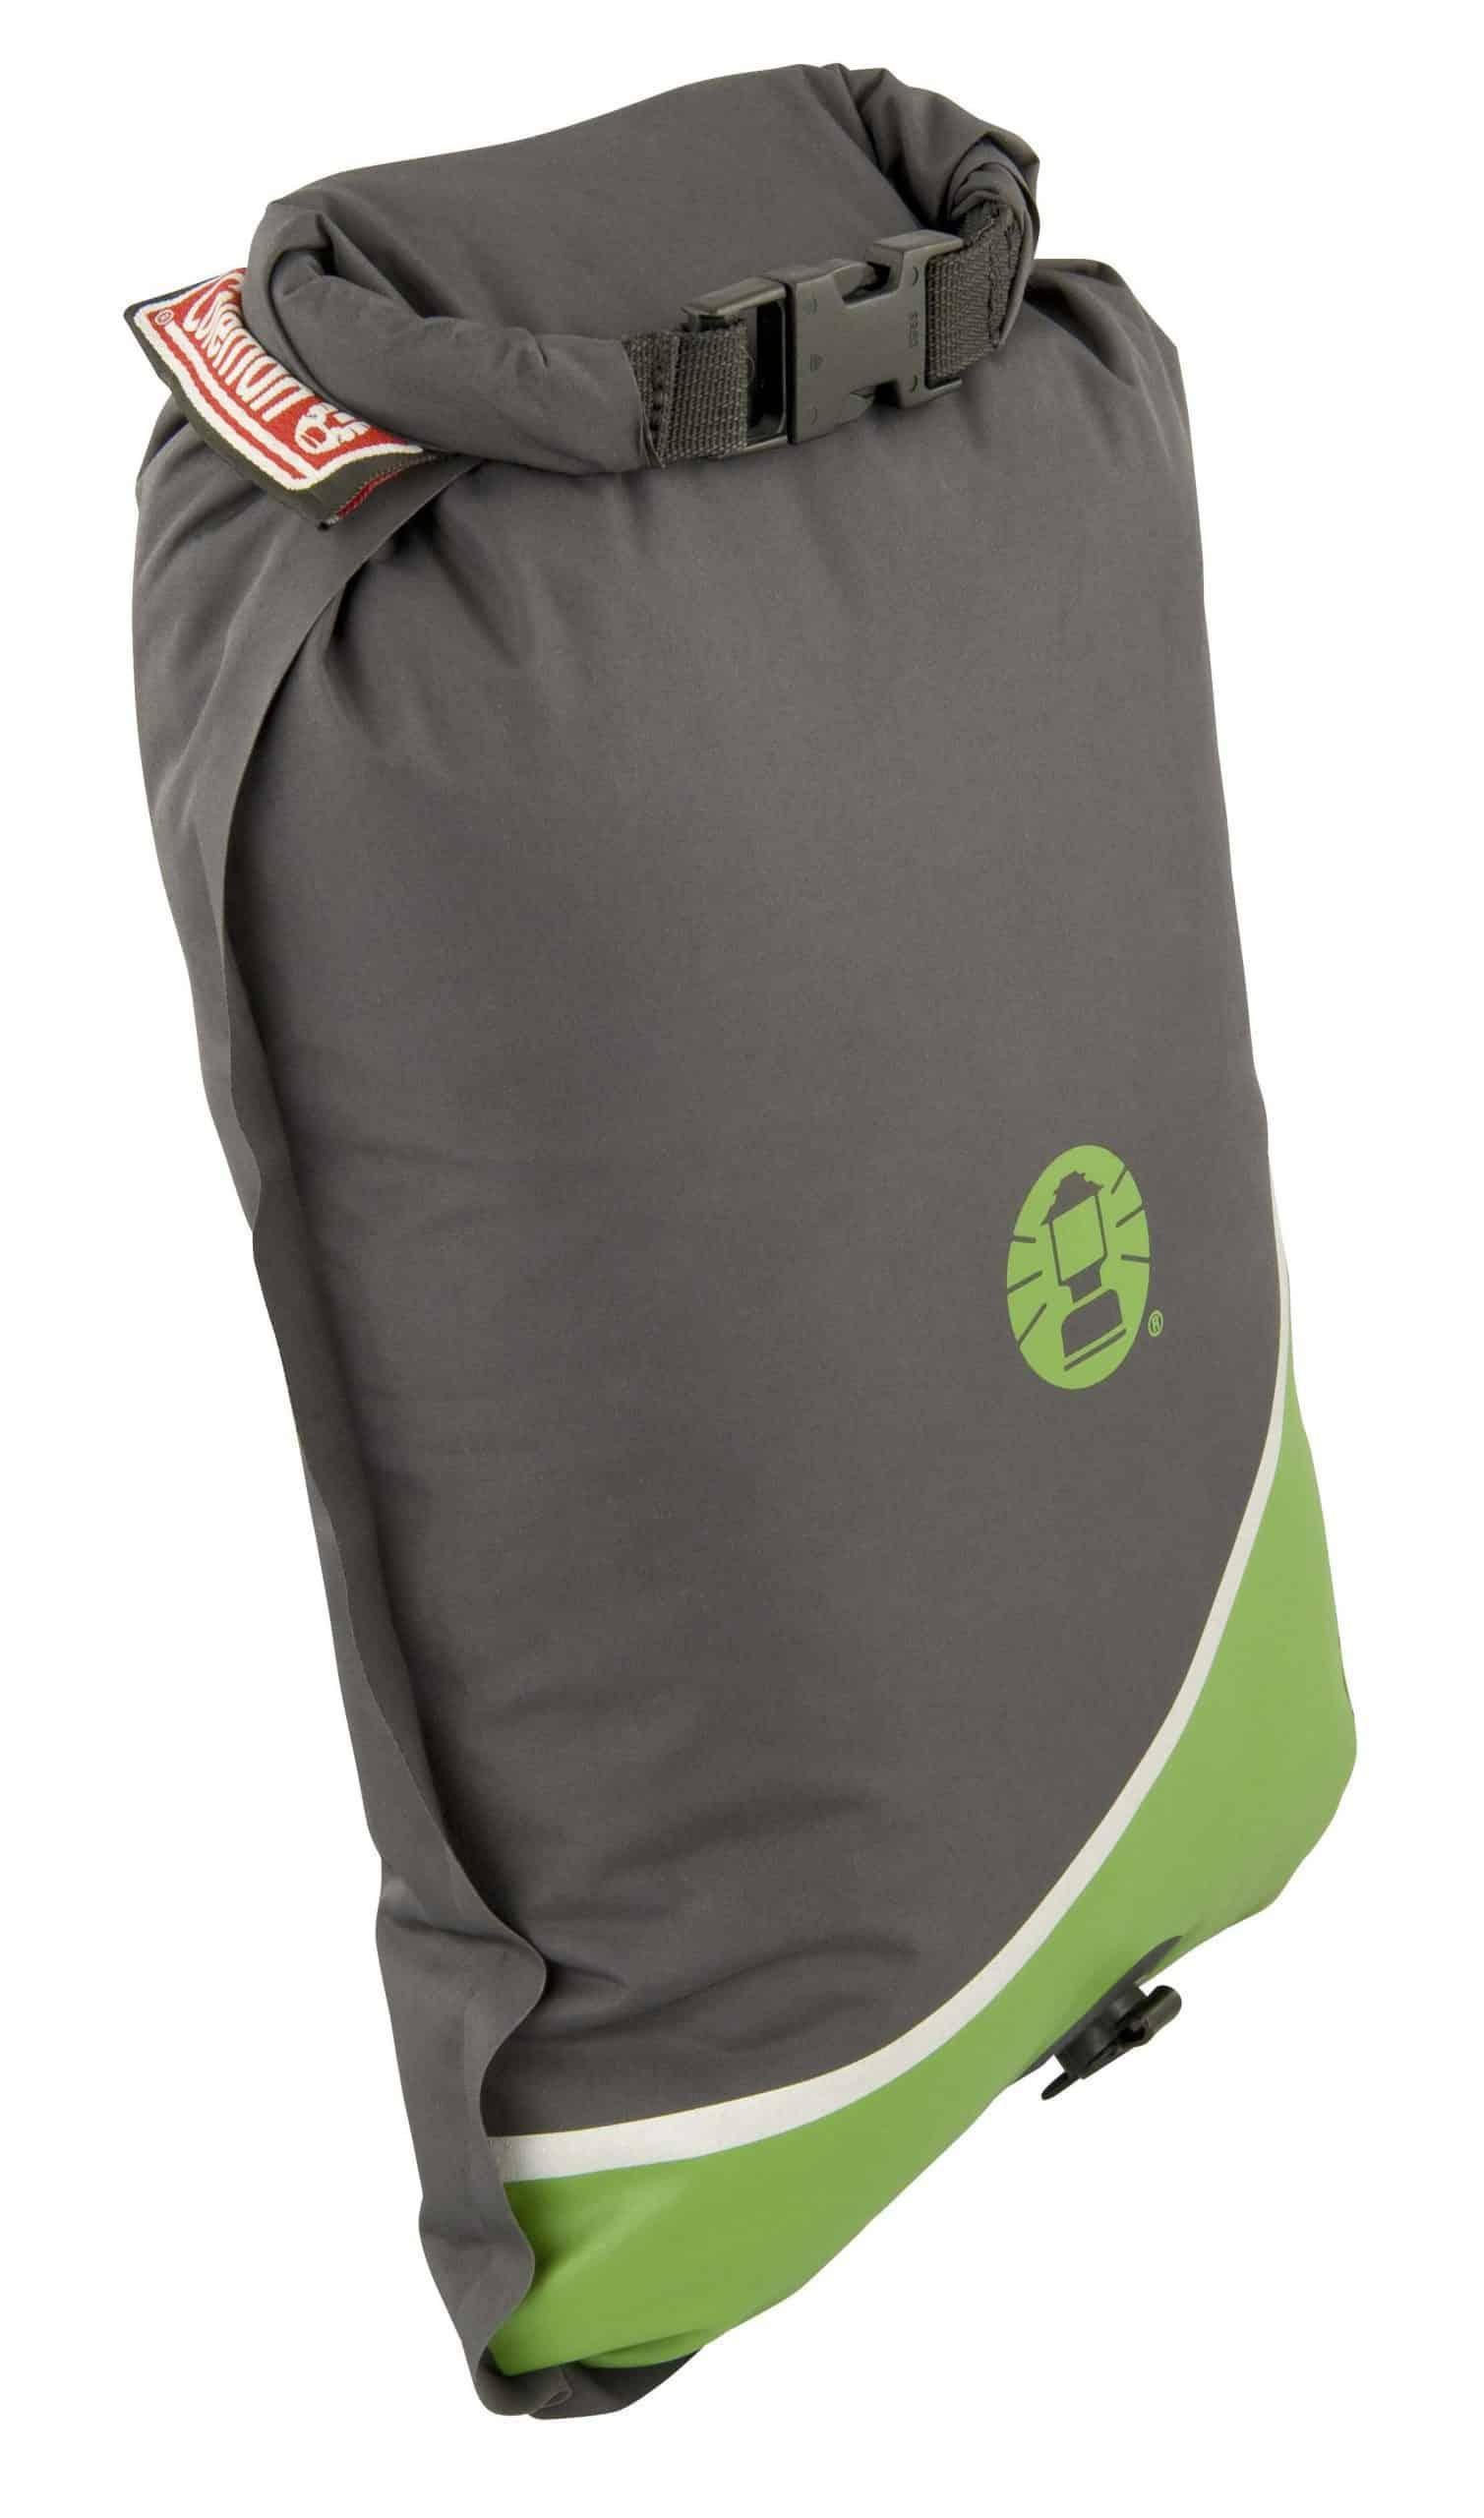 Coleman Sleeping Bag Mummy Biker Compact